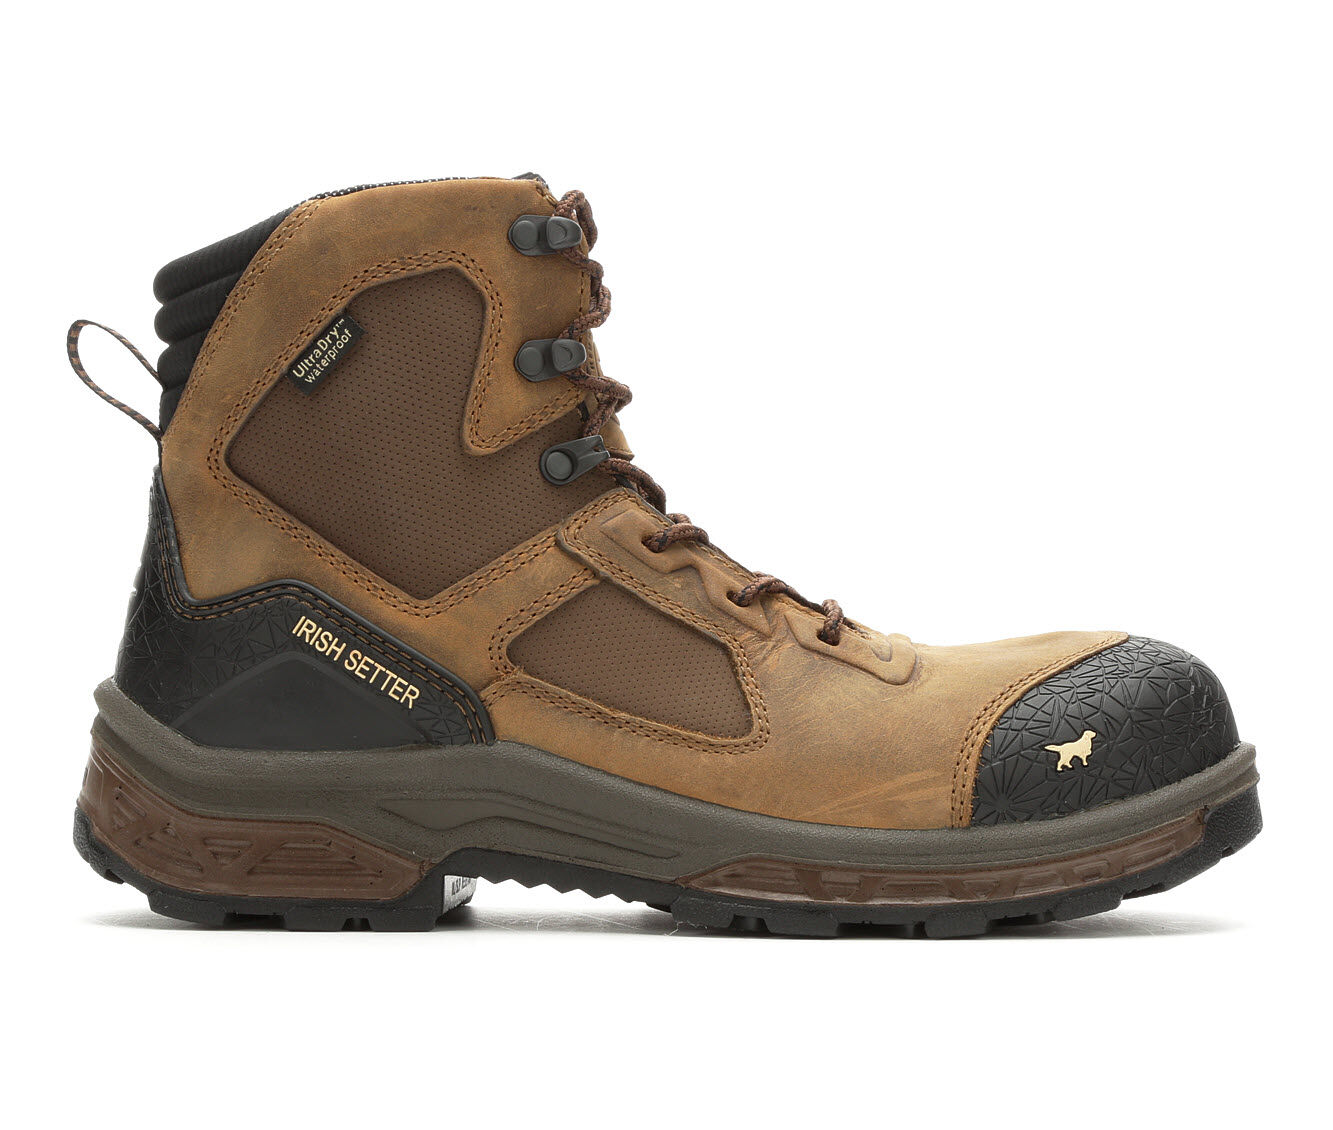 Men's Red Wing-Irish Setter Kasota Side Zip Work Boots Brown